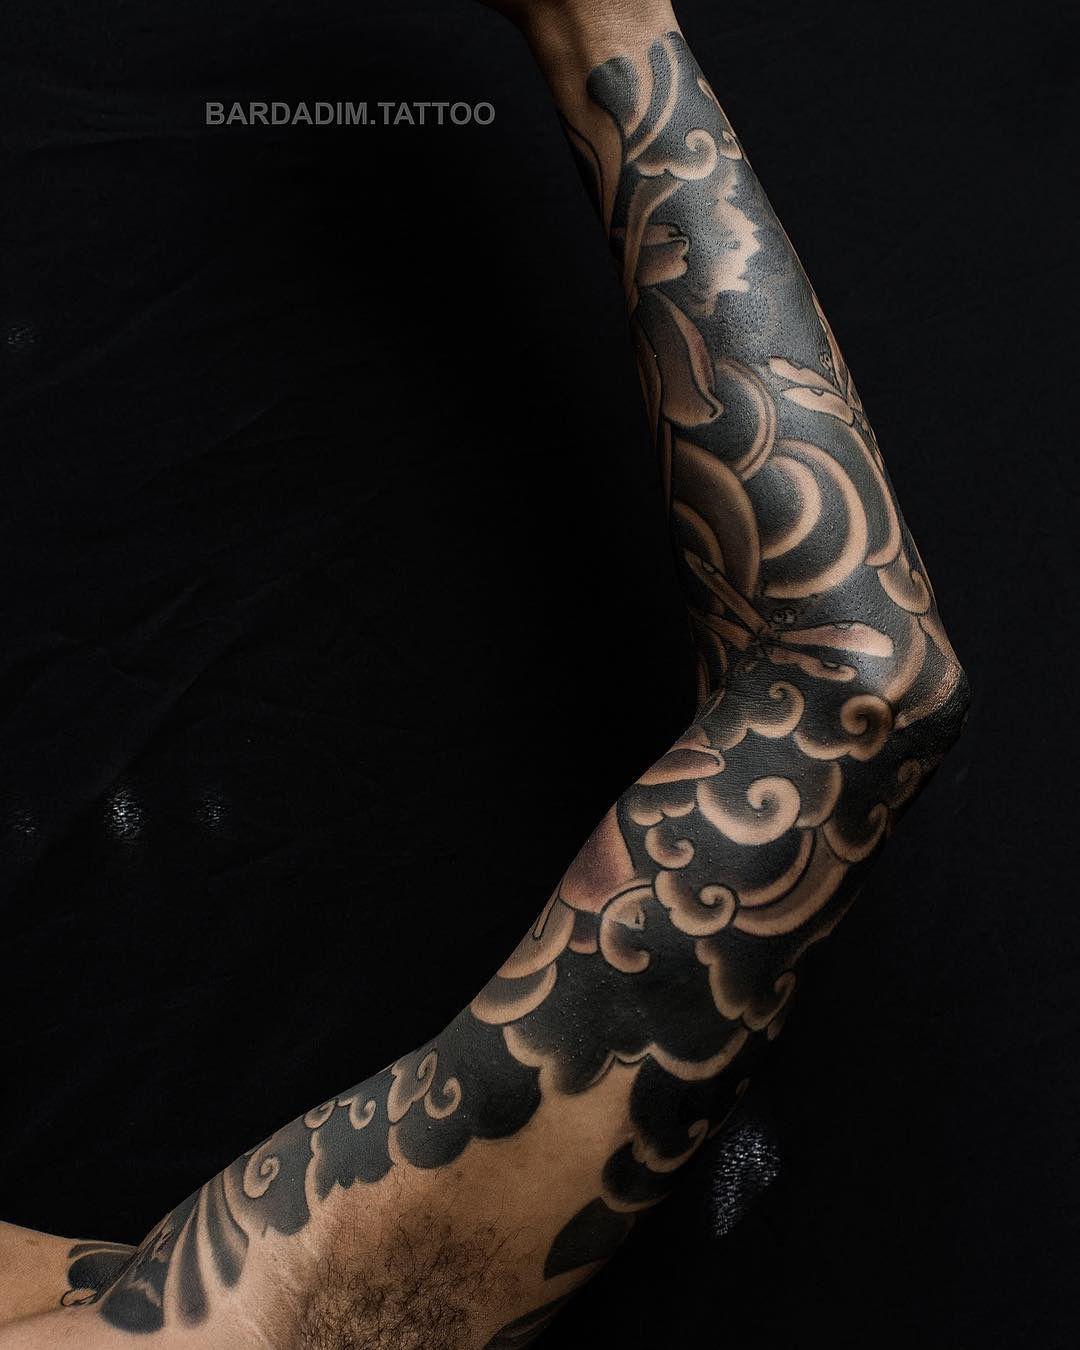 Japanese Sleeve Tattoo Dark Skin Tattoo Japanese Sleeve Tattoos Sleeve Tattoos